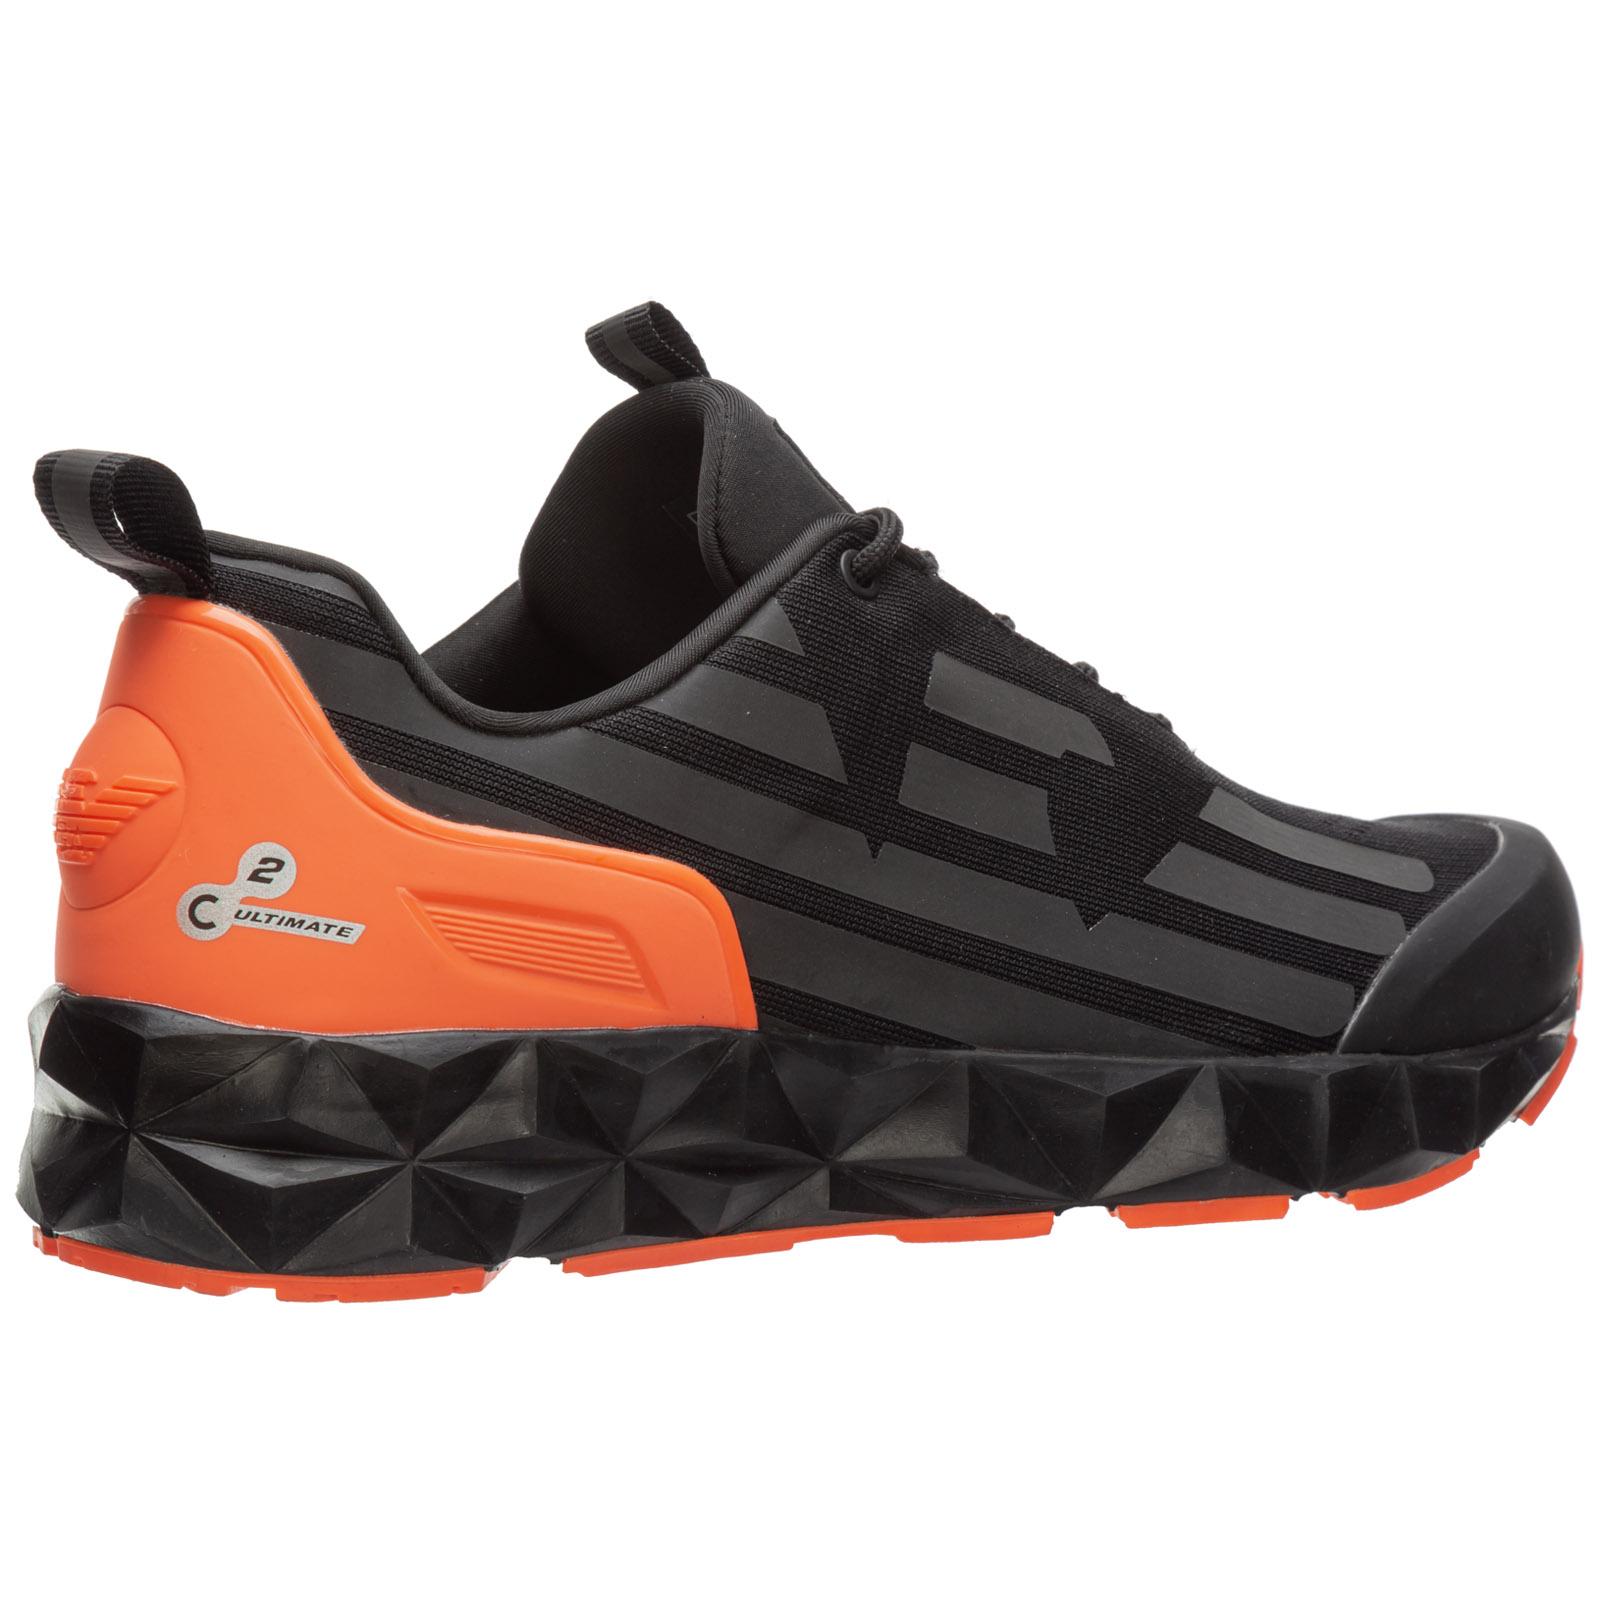 Sneakers Emporio Armani EA7 c2 light